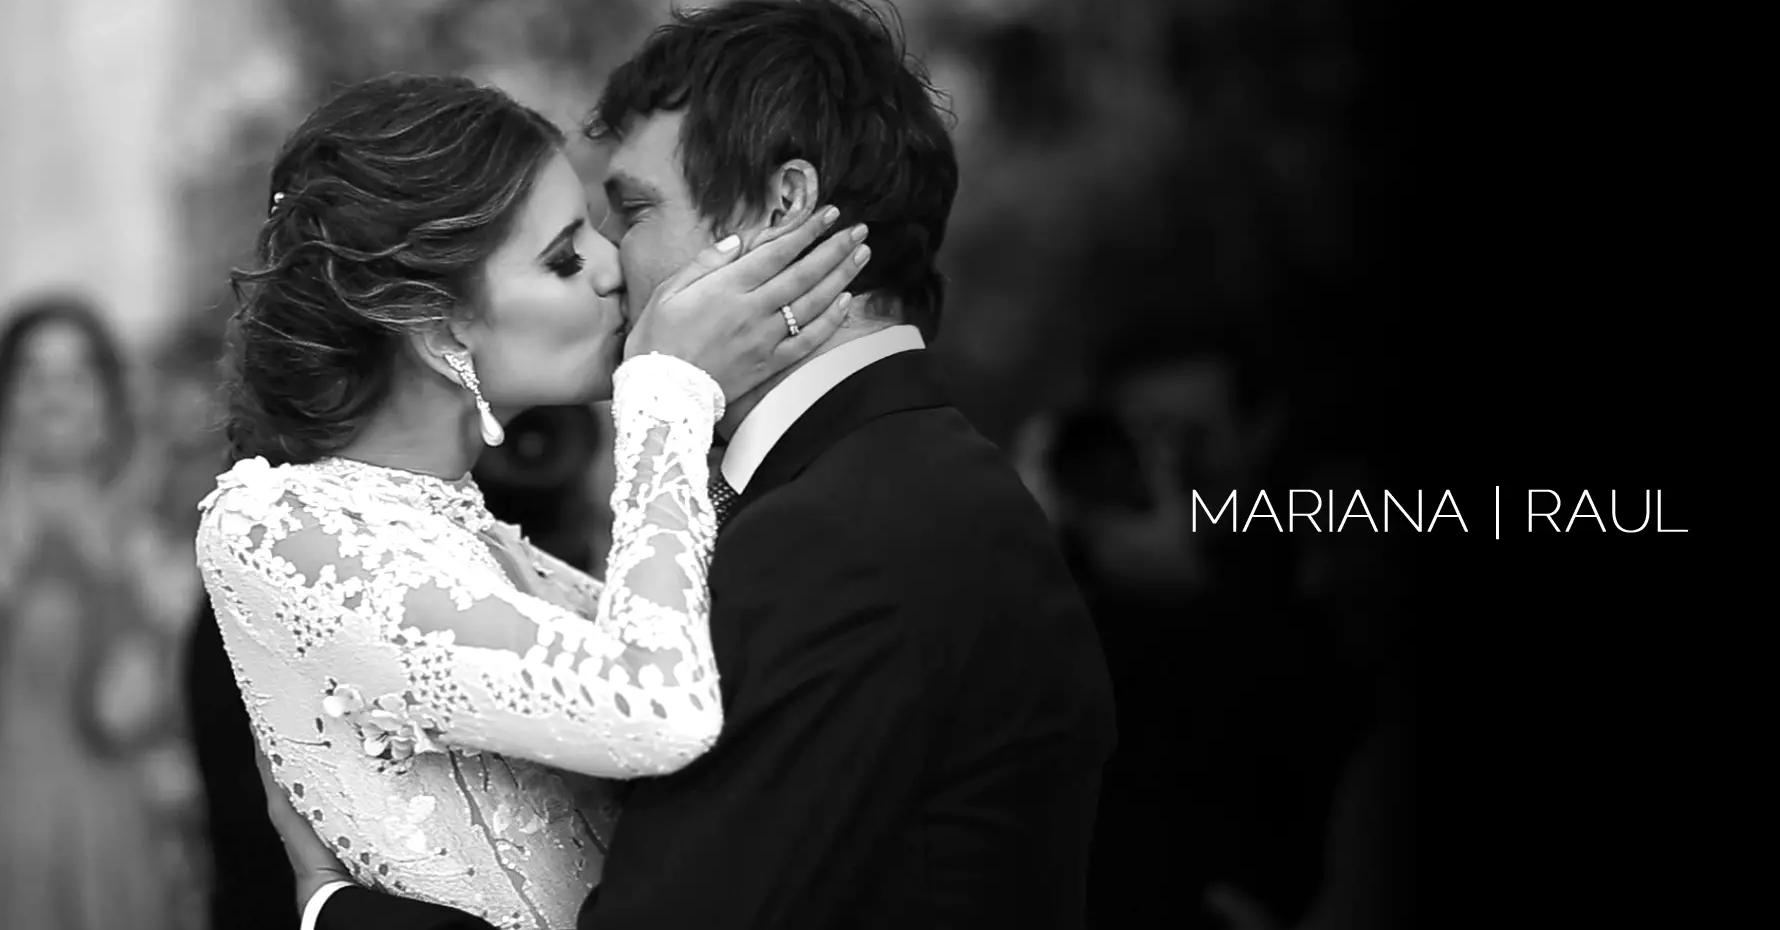 Mariana e Raul